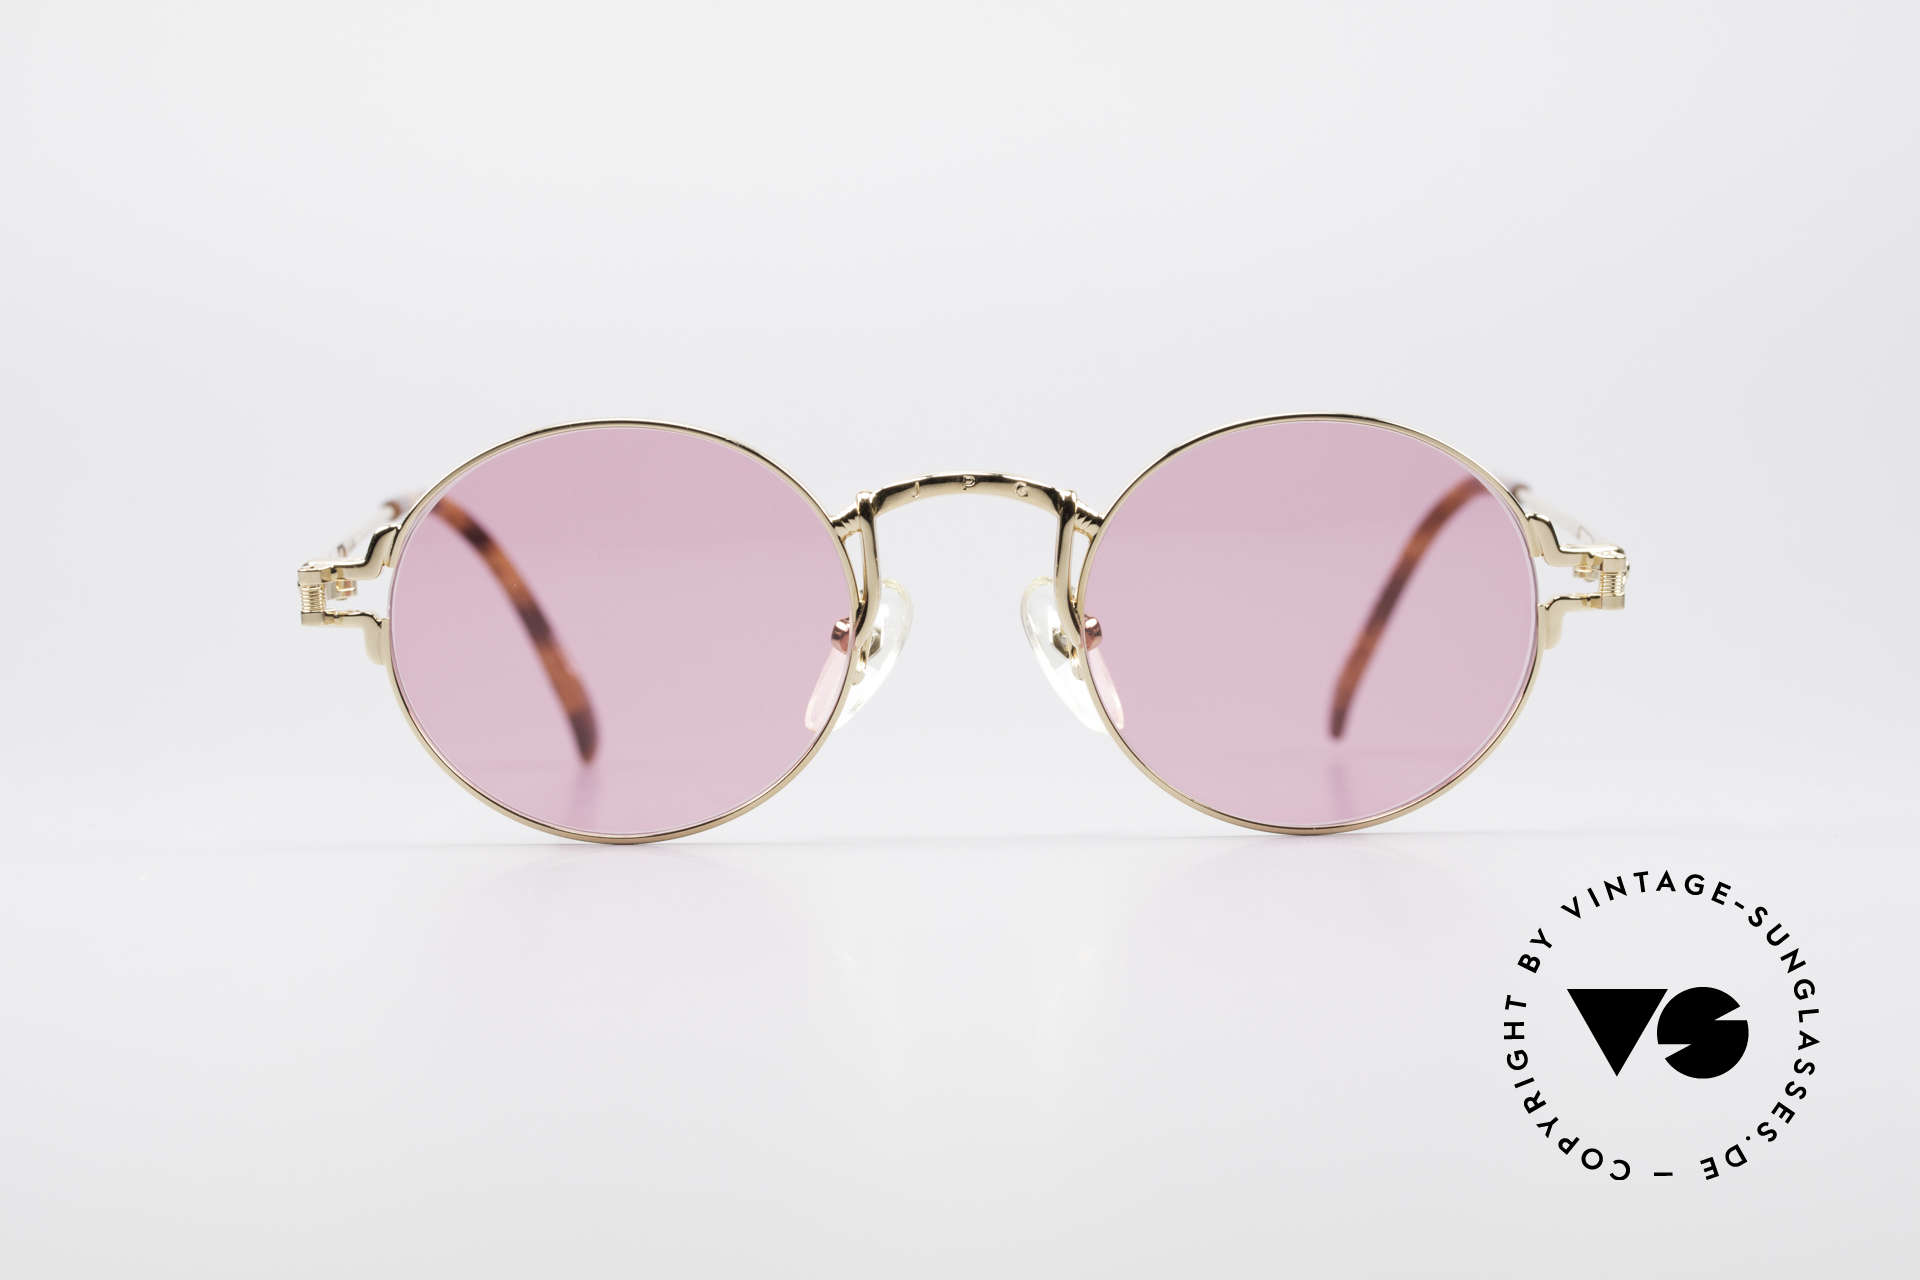 8b7d41635 Sunglasses Jean Paul Gaultier 55-3171 Small Round Sunglasses ...